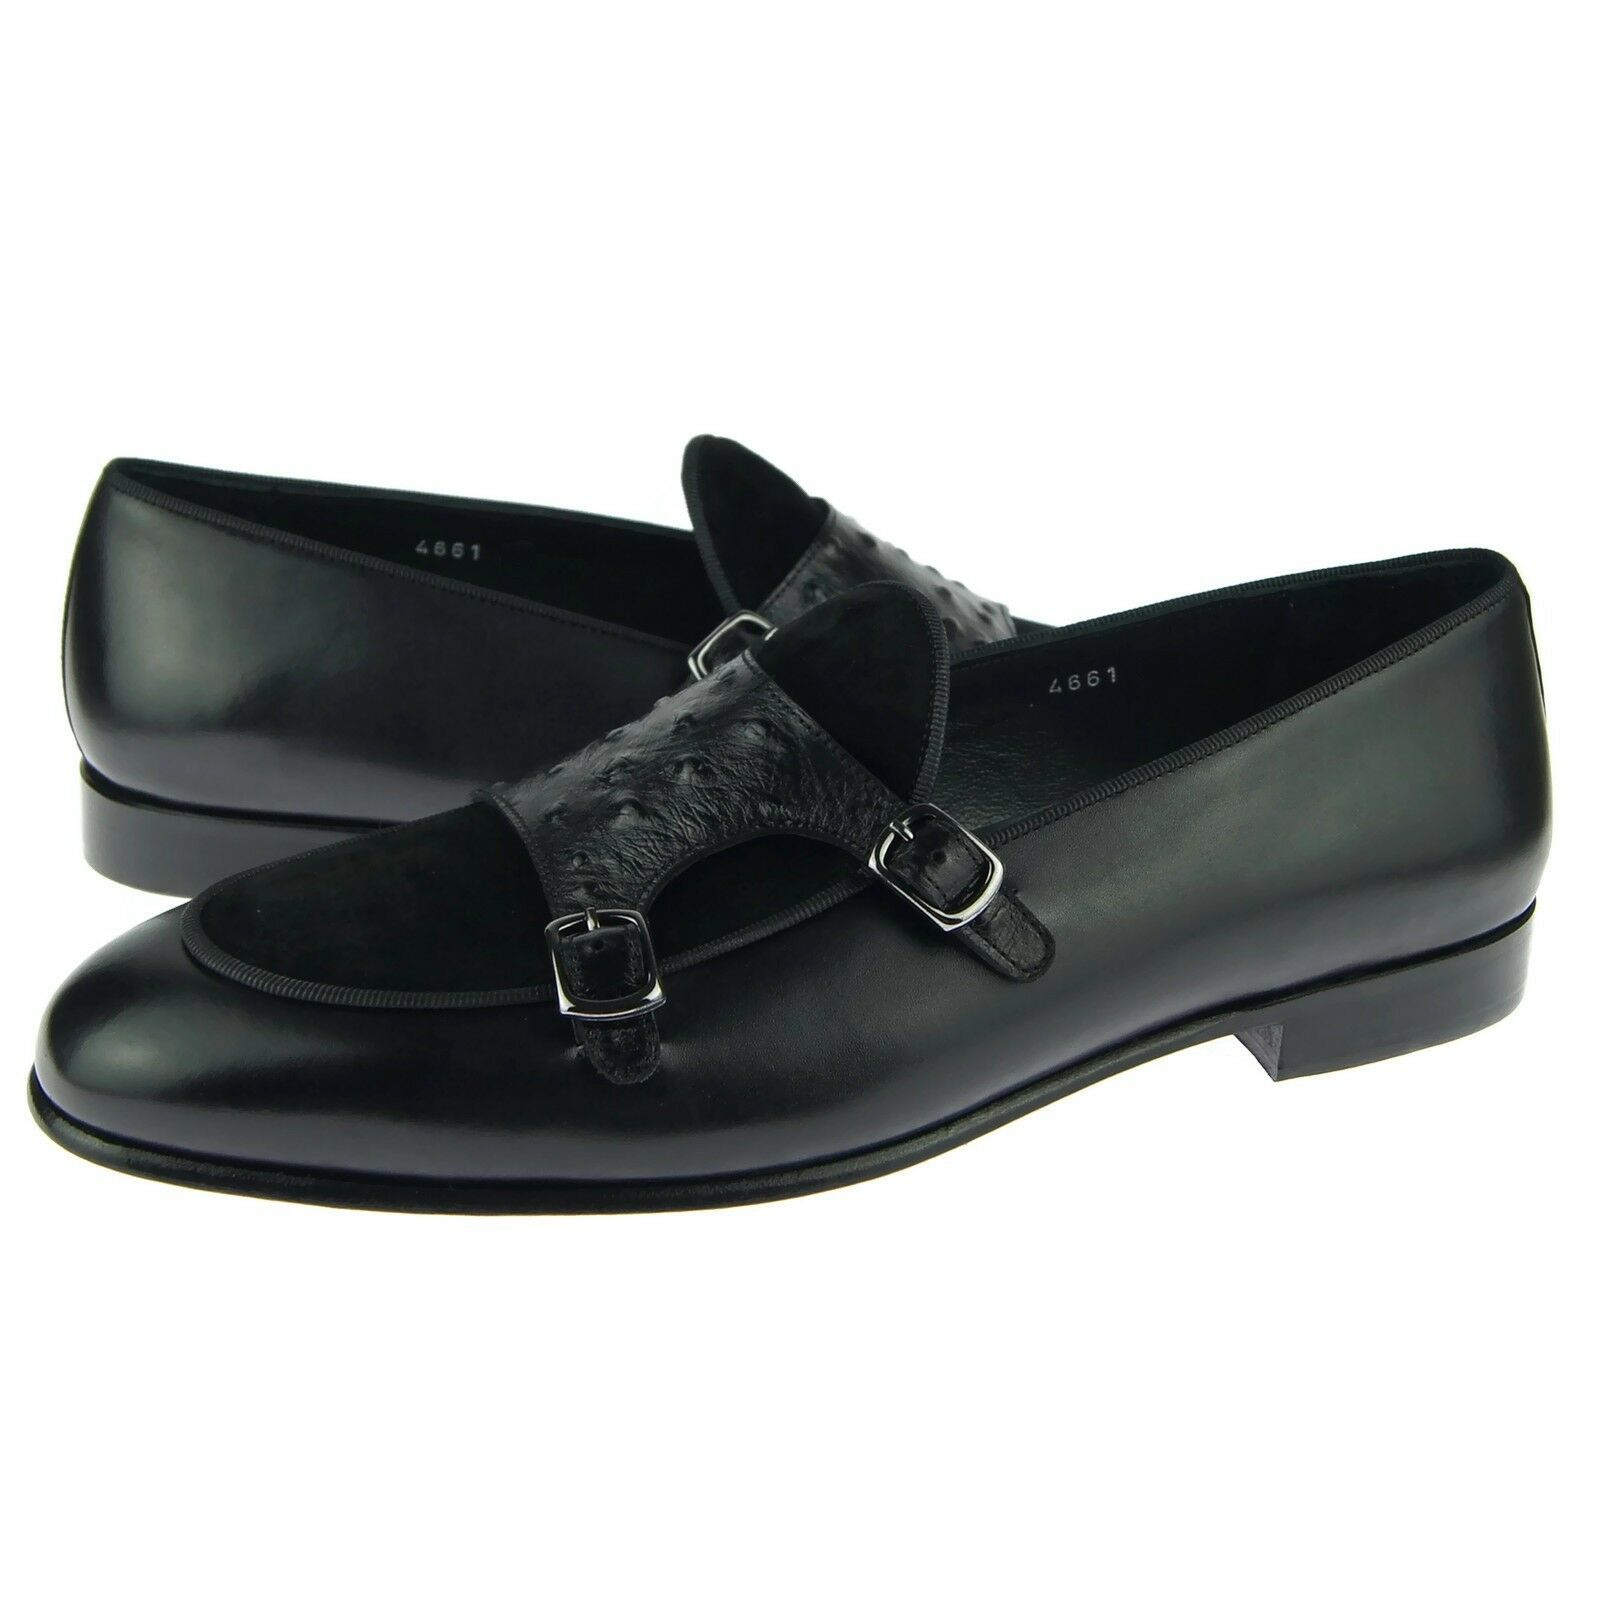 Corrente 4661 Double Monk Loafer, Men's Dress Leather scarpe, nero